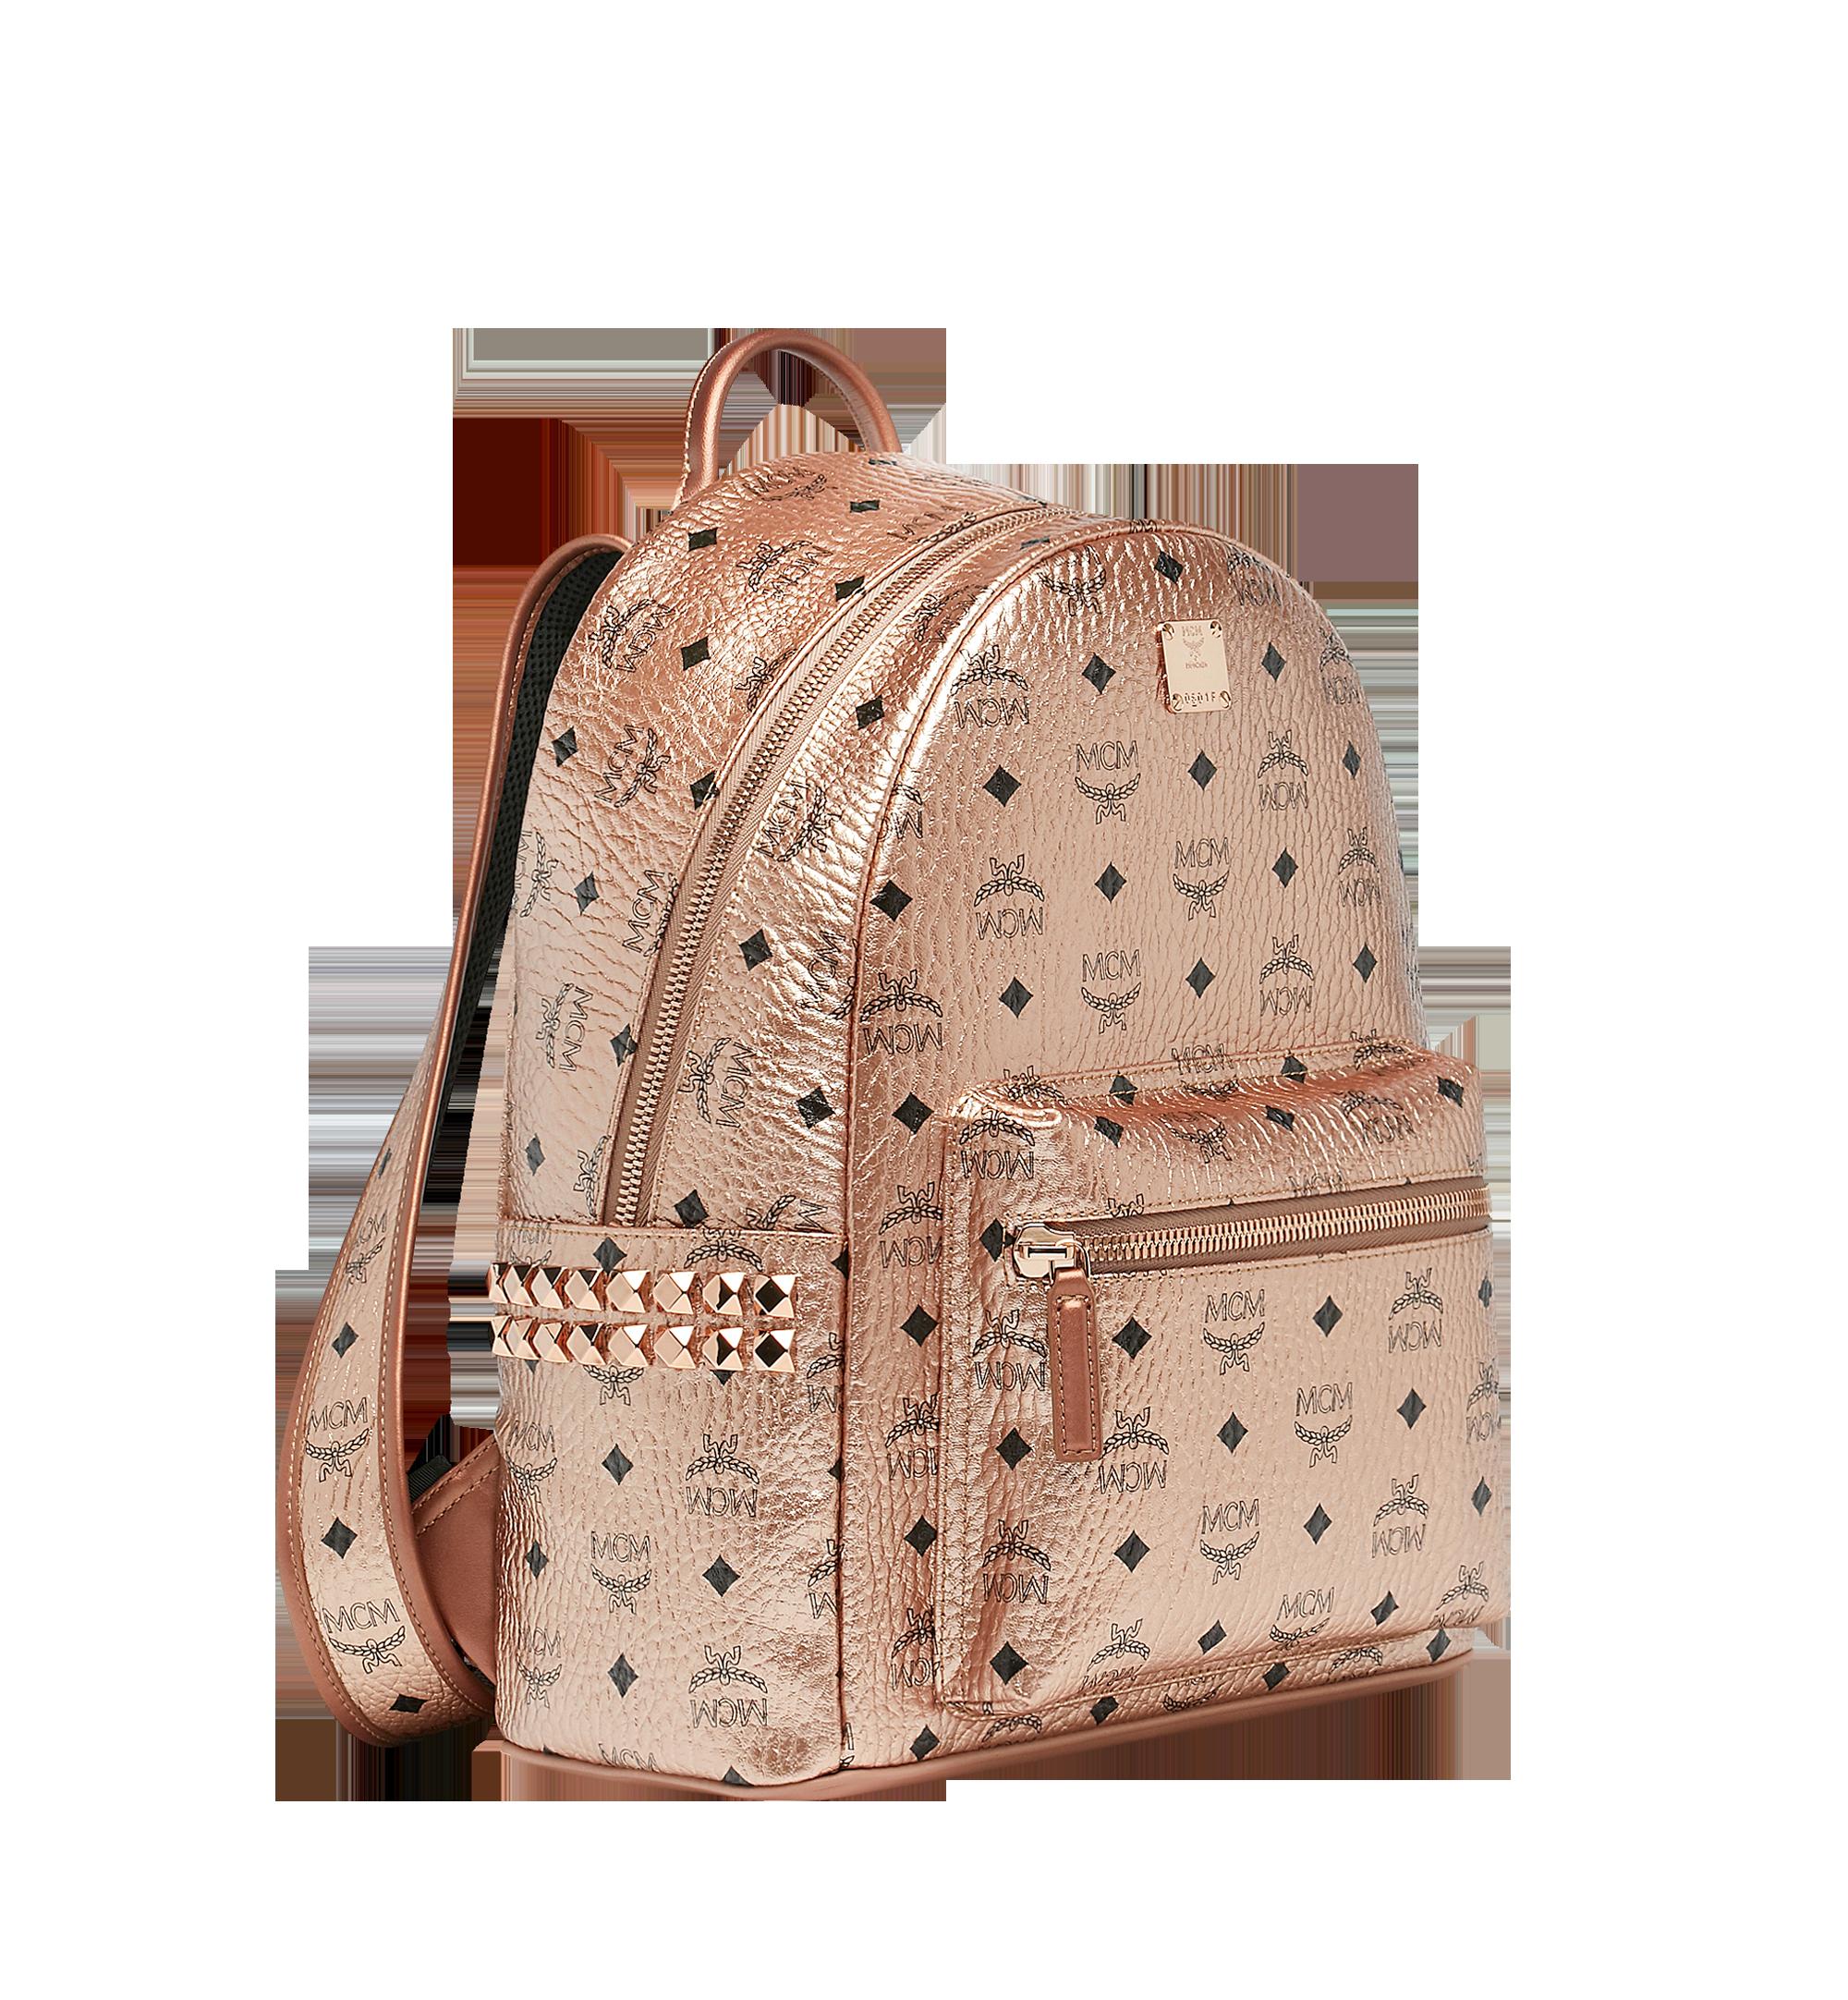 37 cm 14.5 in Stark Side Studs Backpack in Visetos